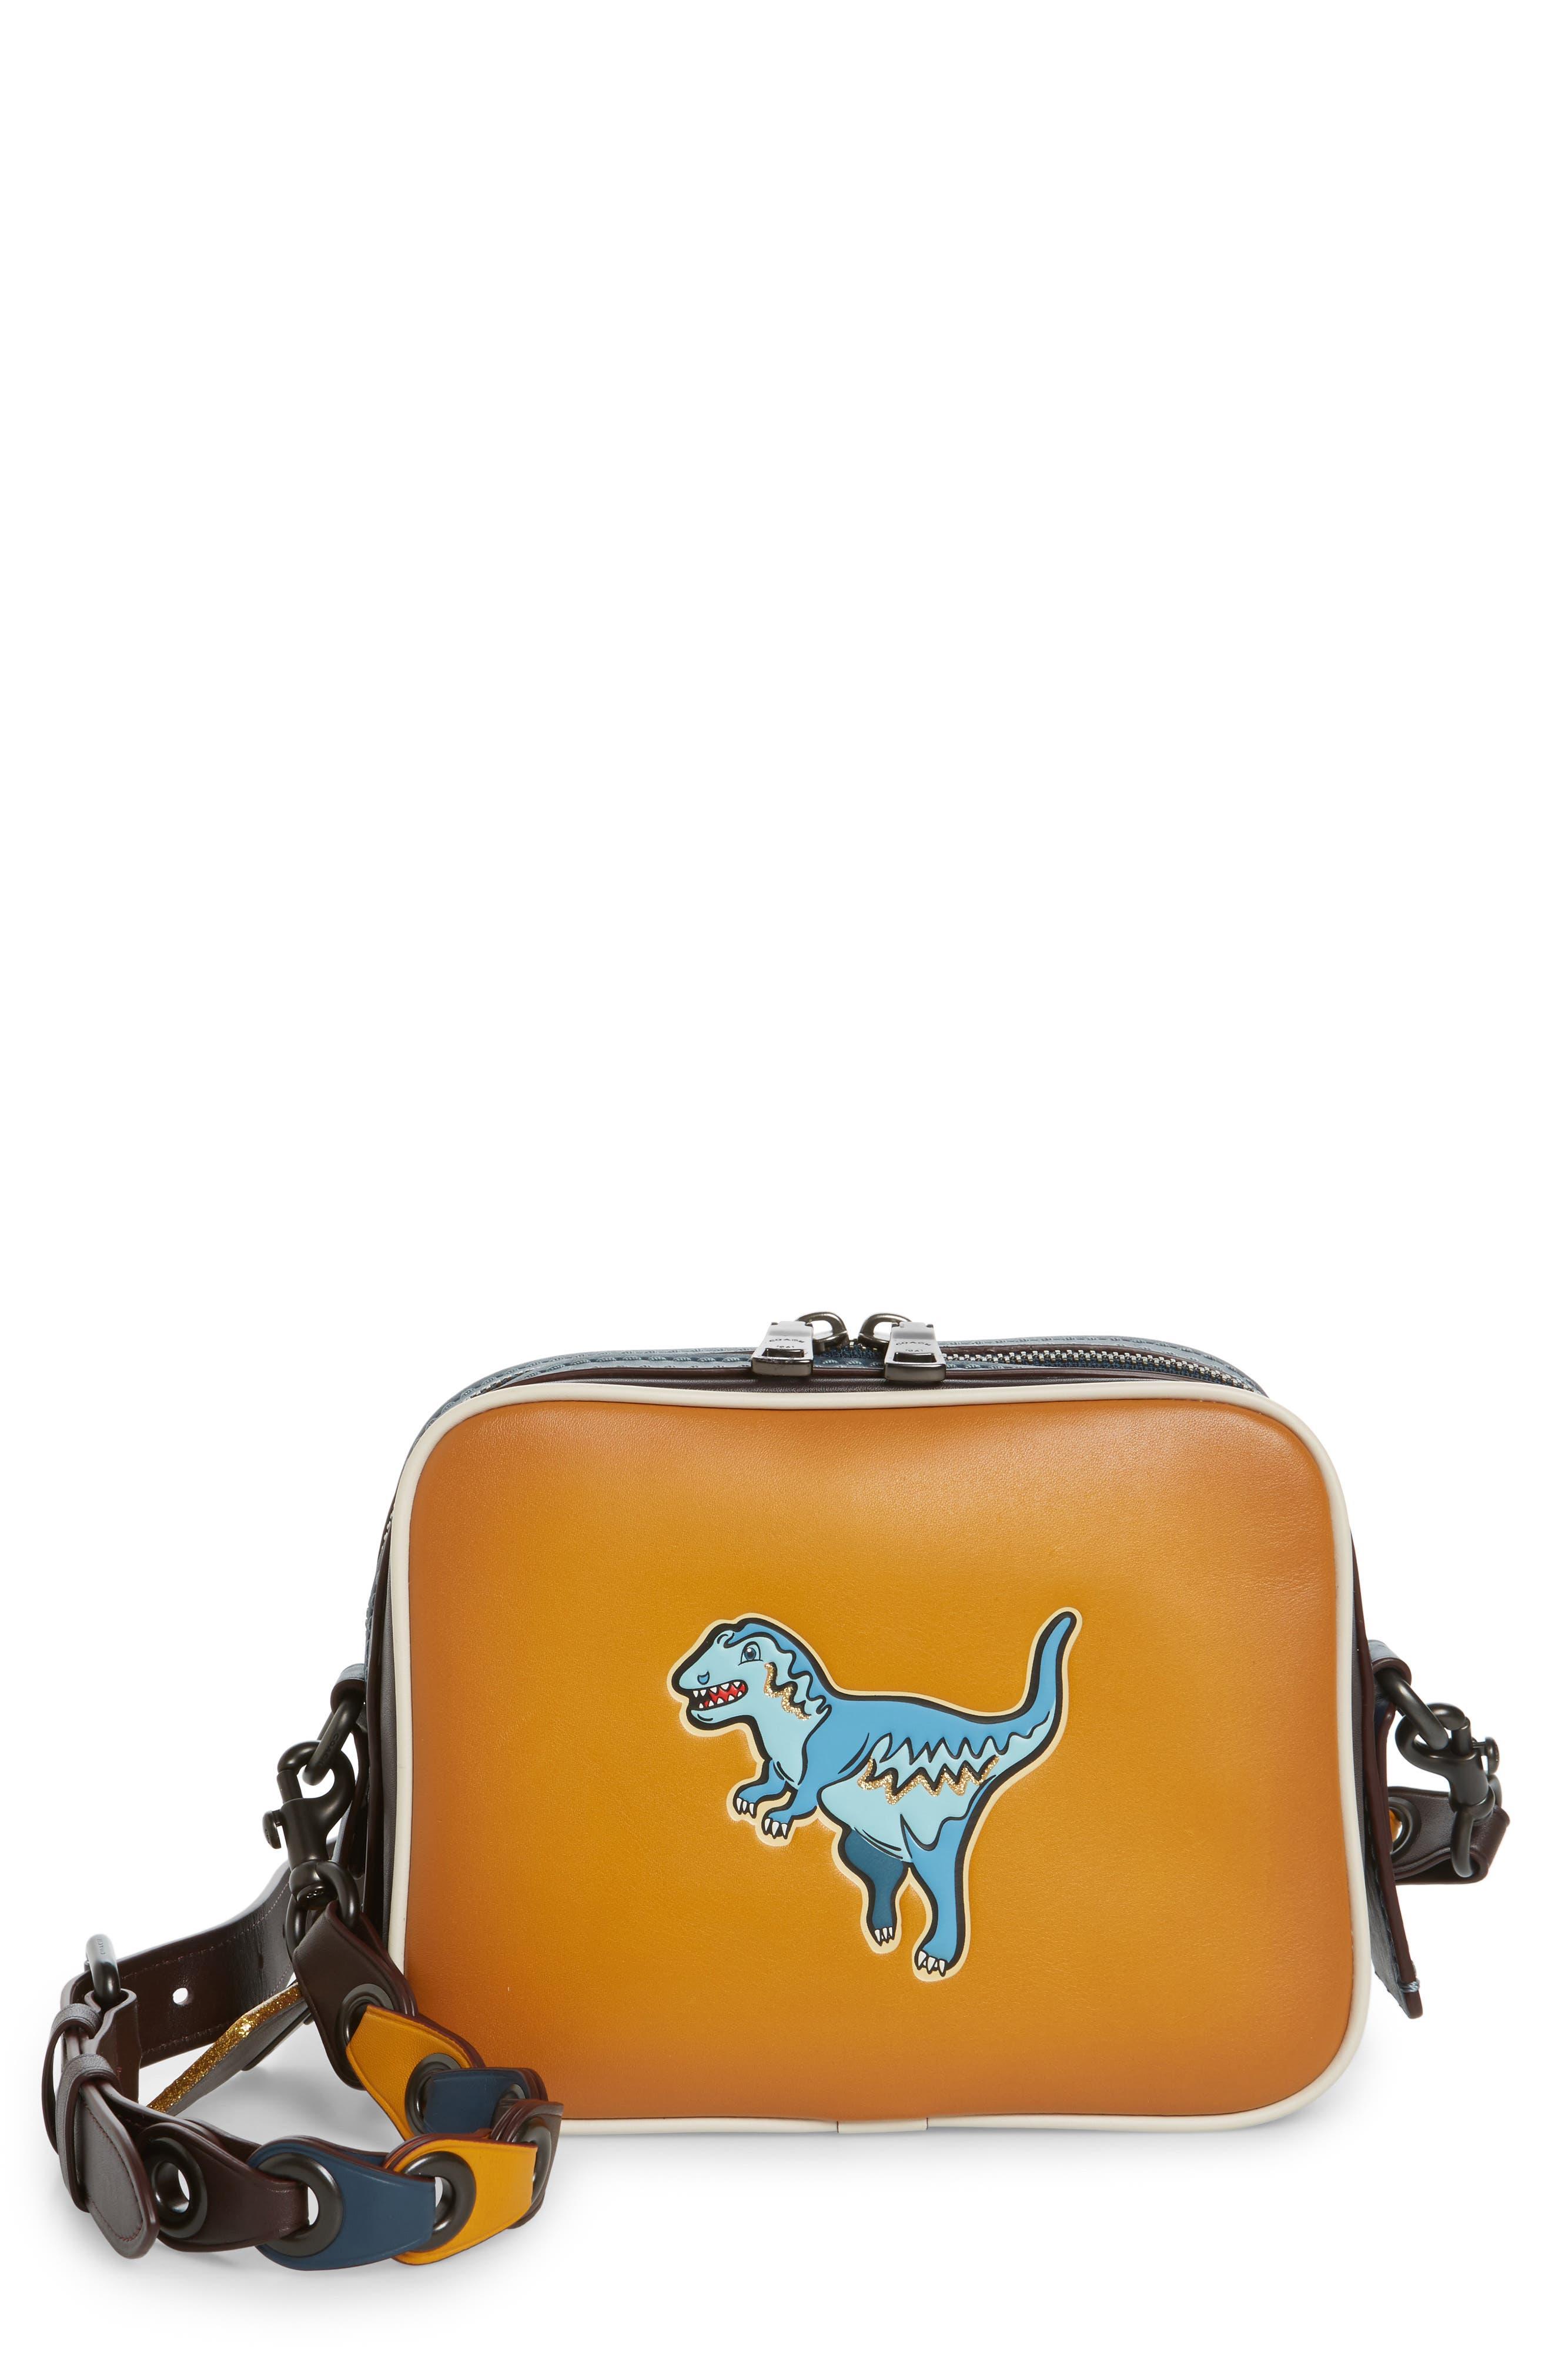 COACH 1941 Rexy Leather Crossbody Bag